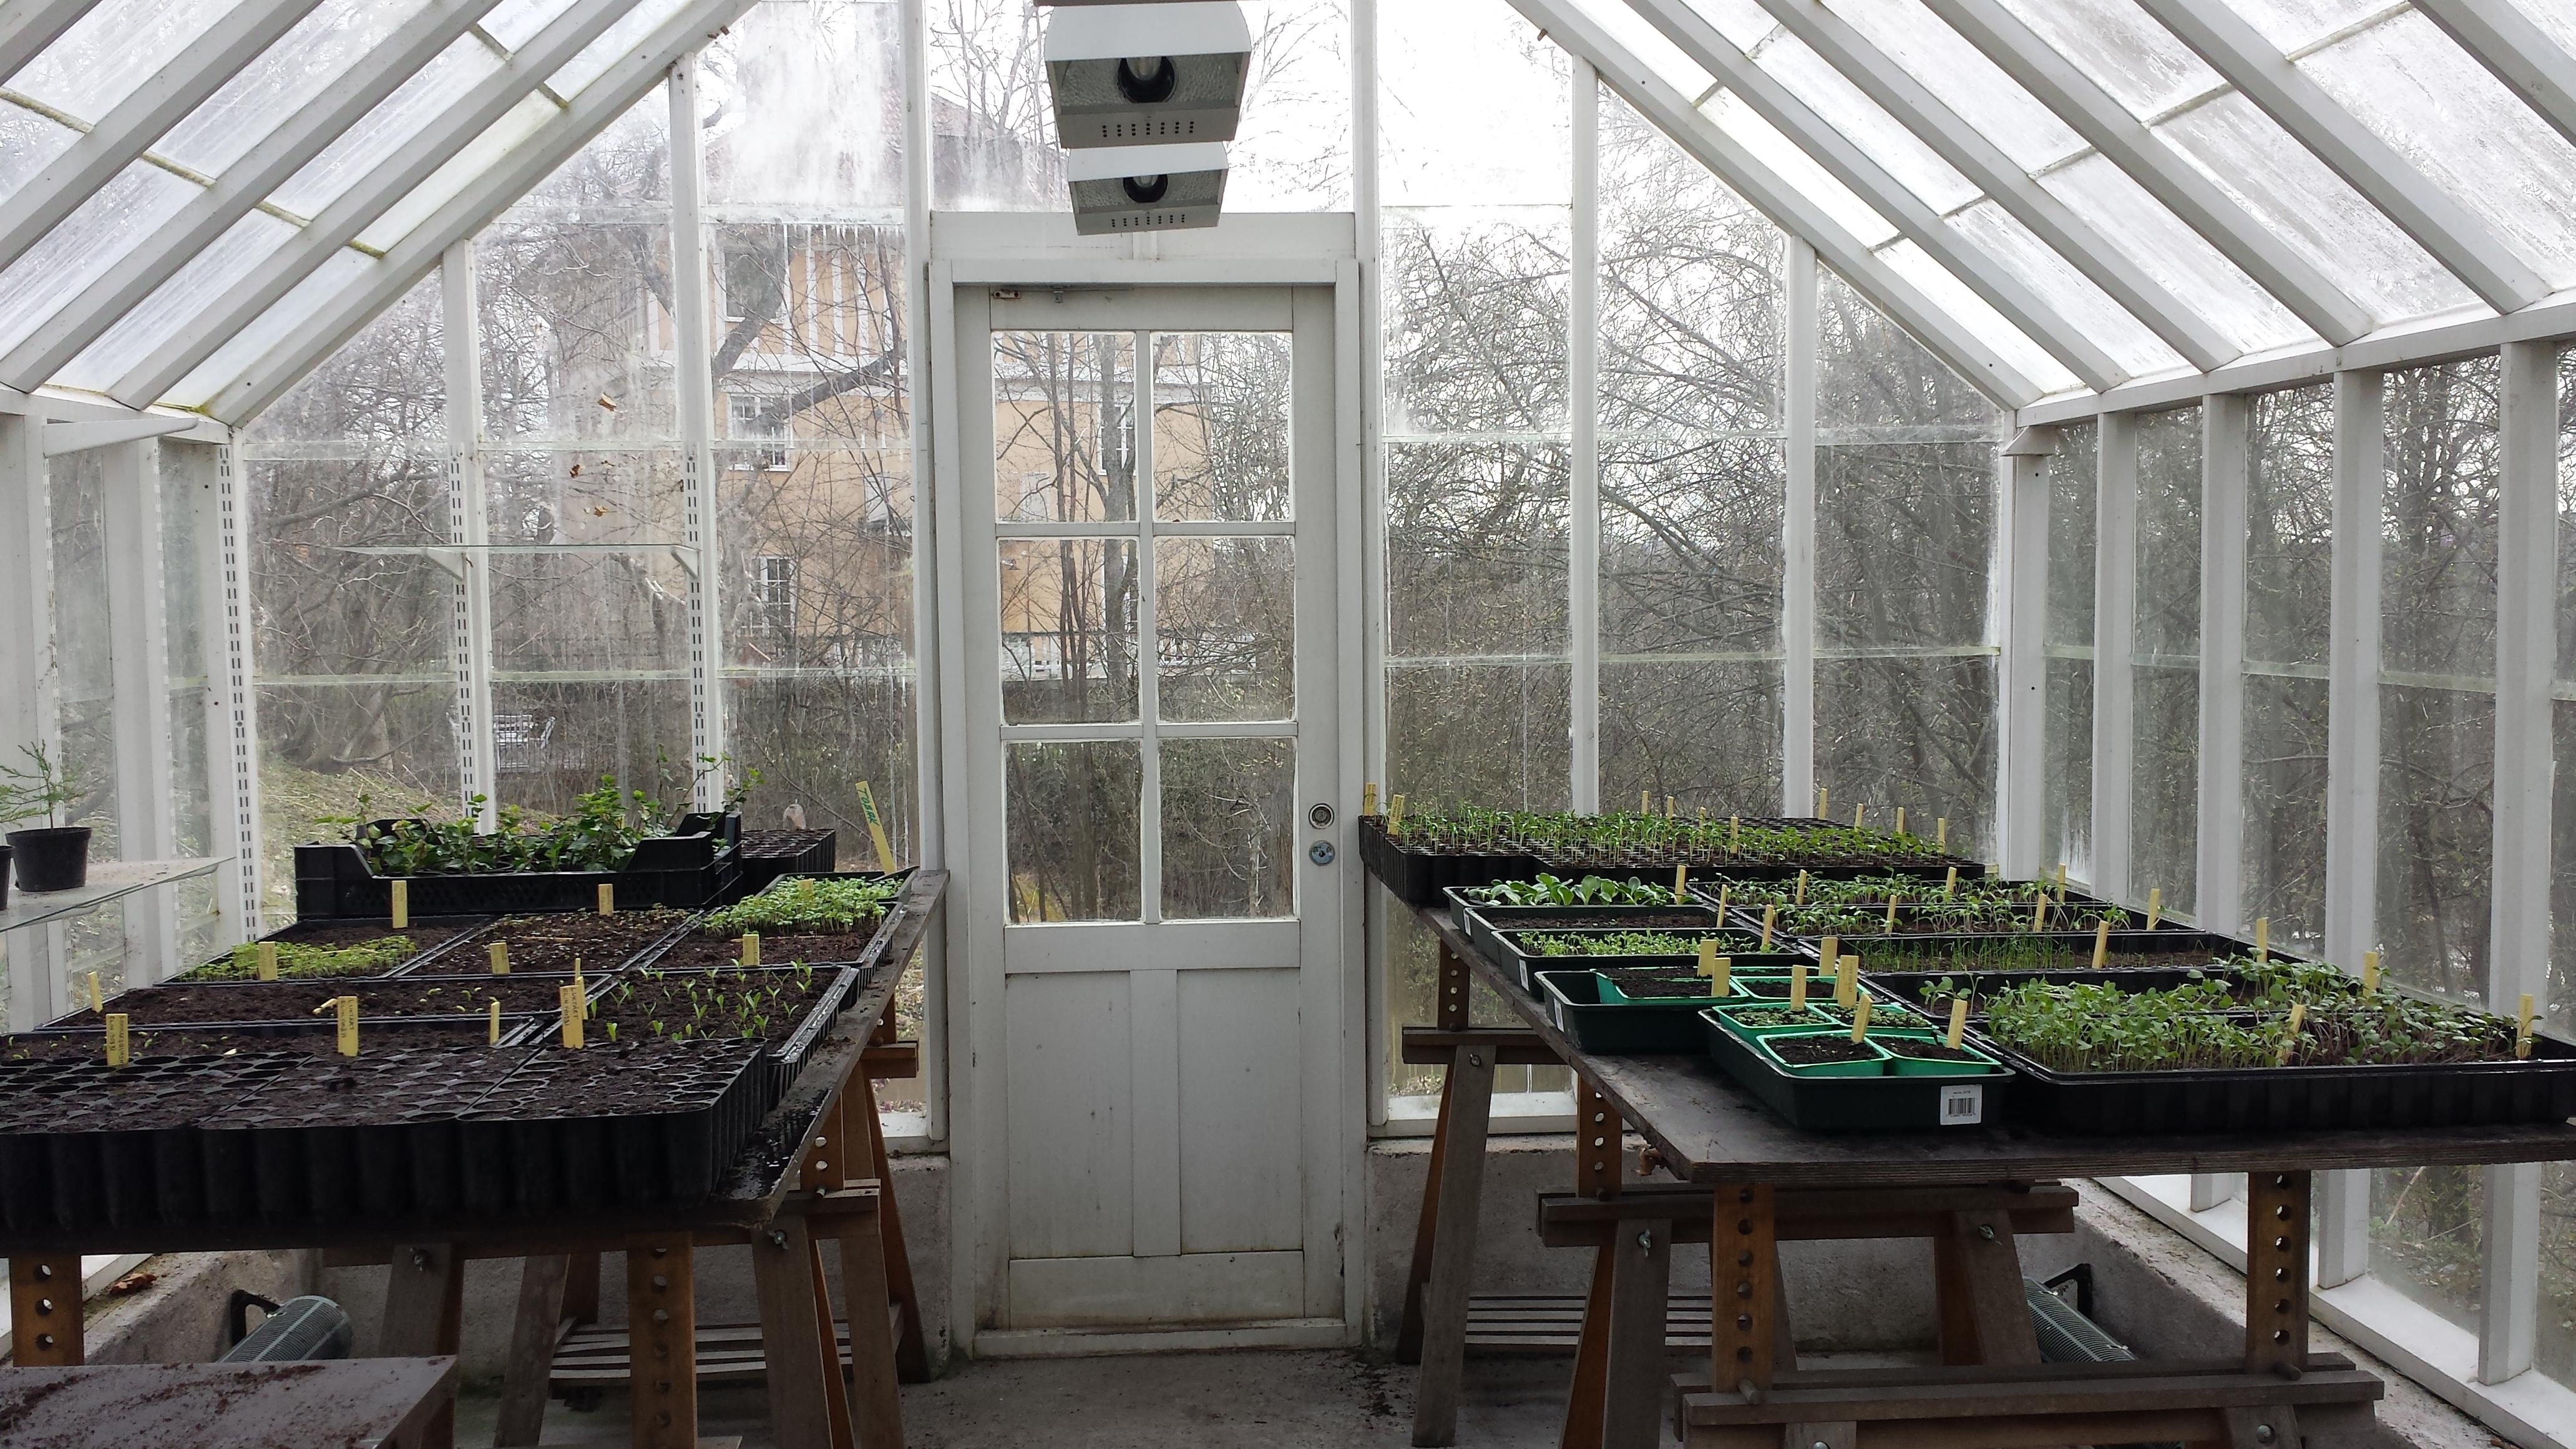 Sådd i växthuset